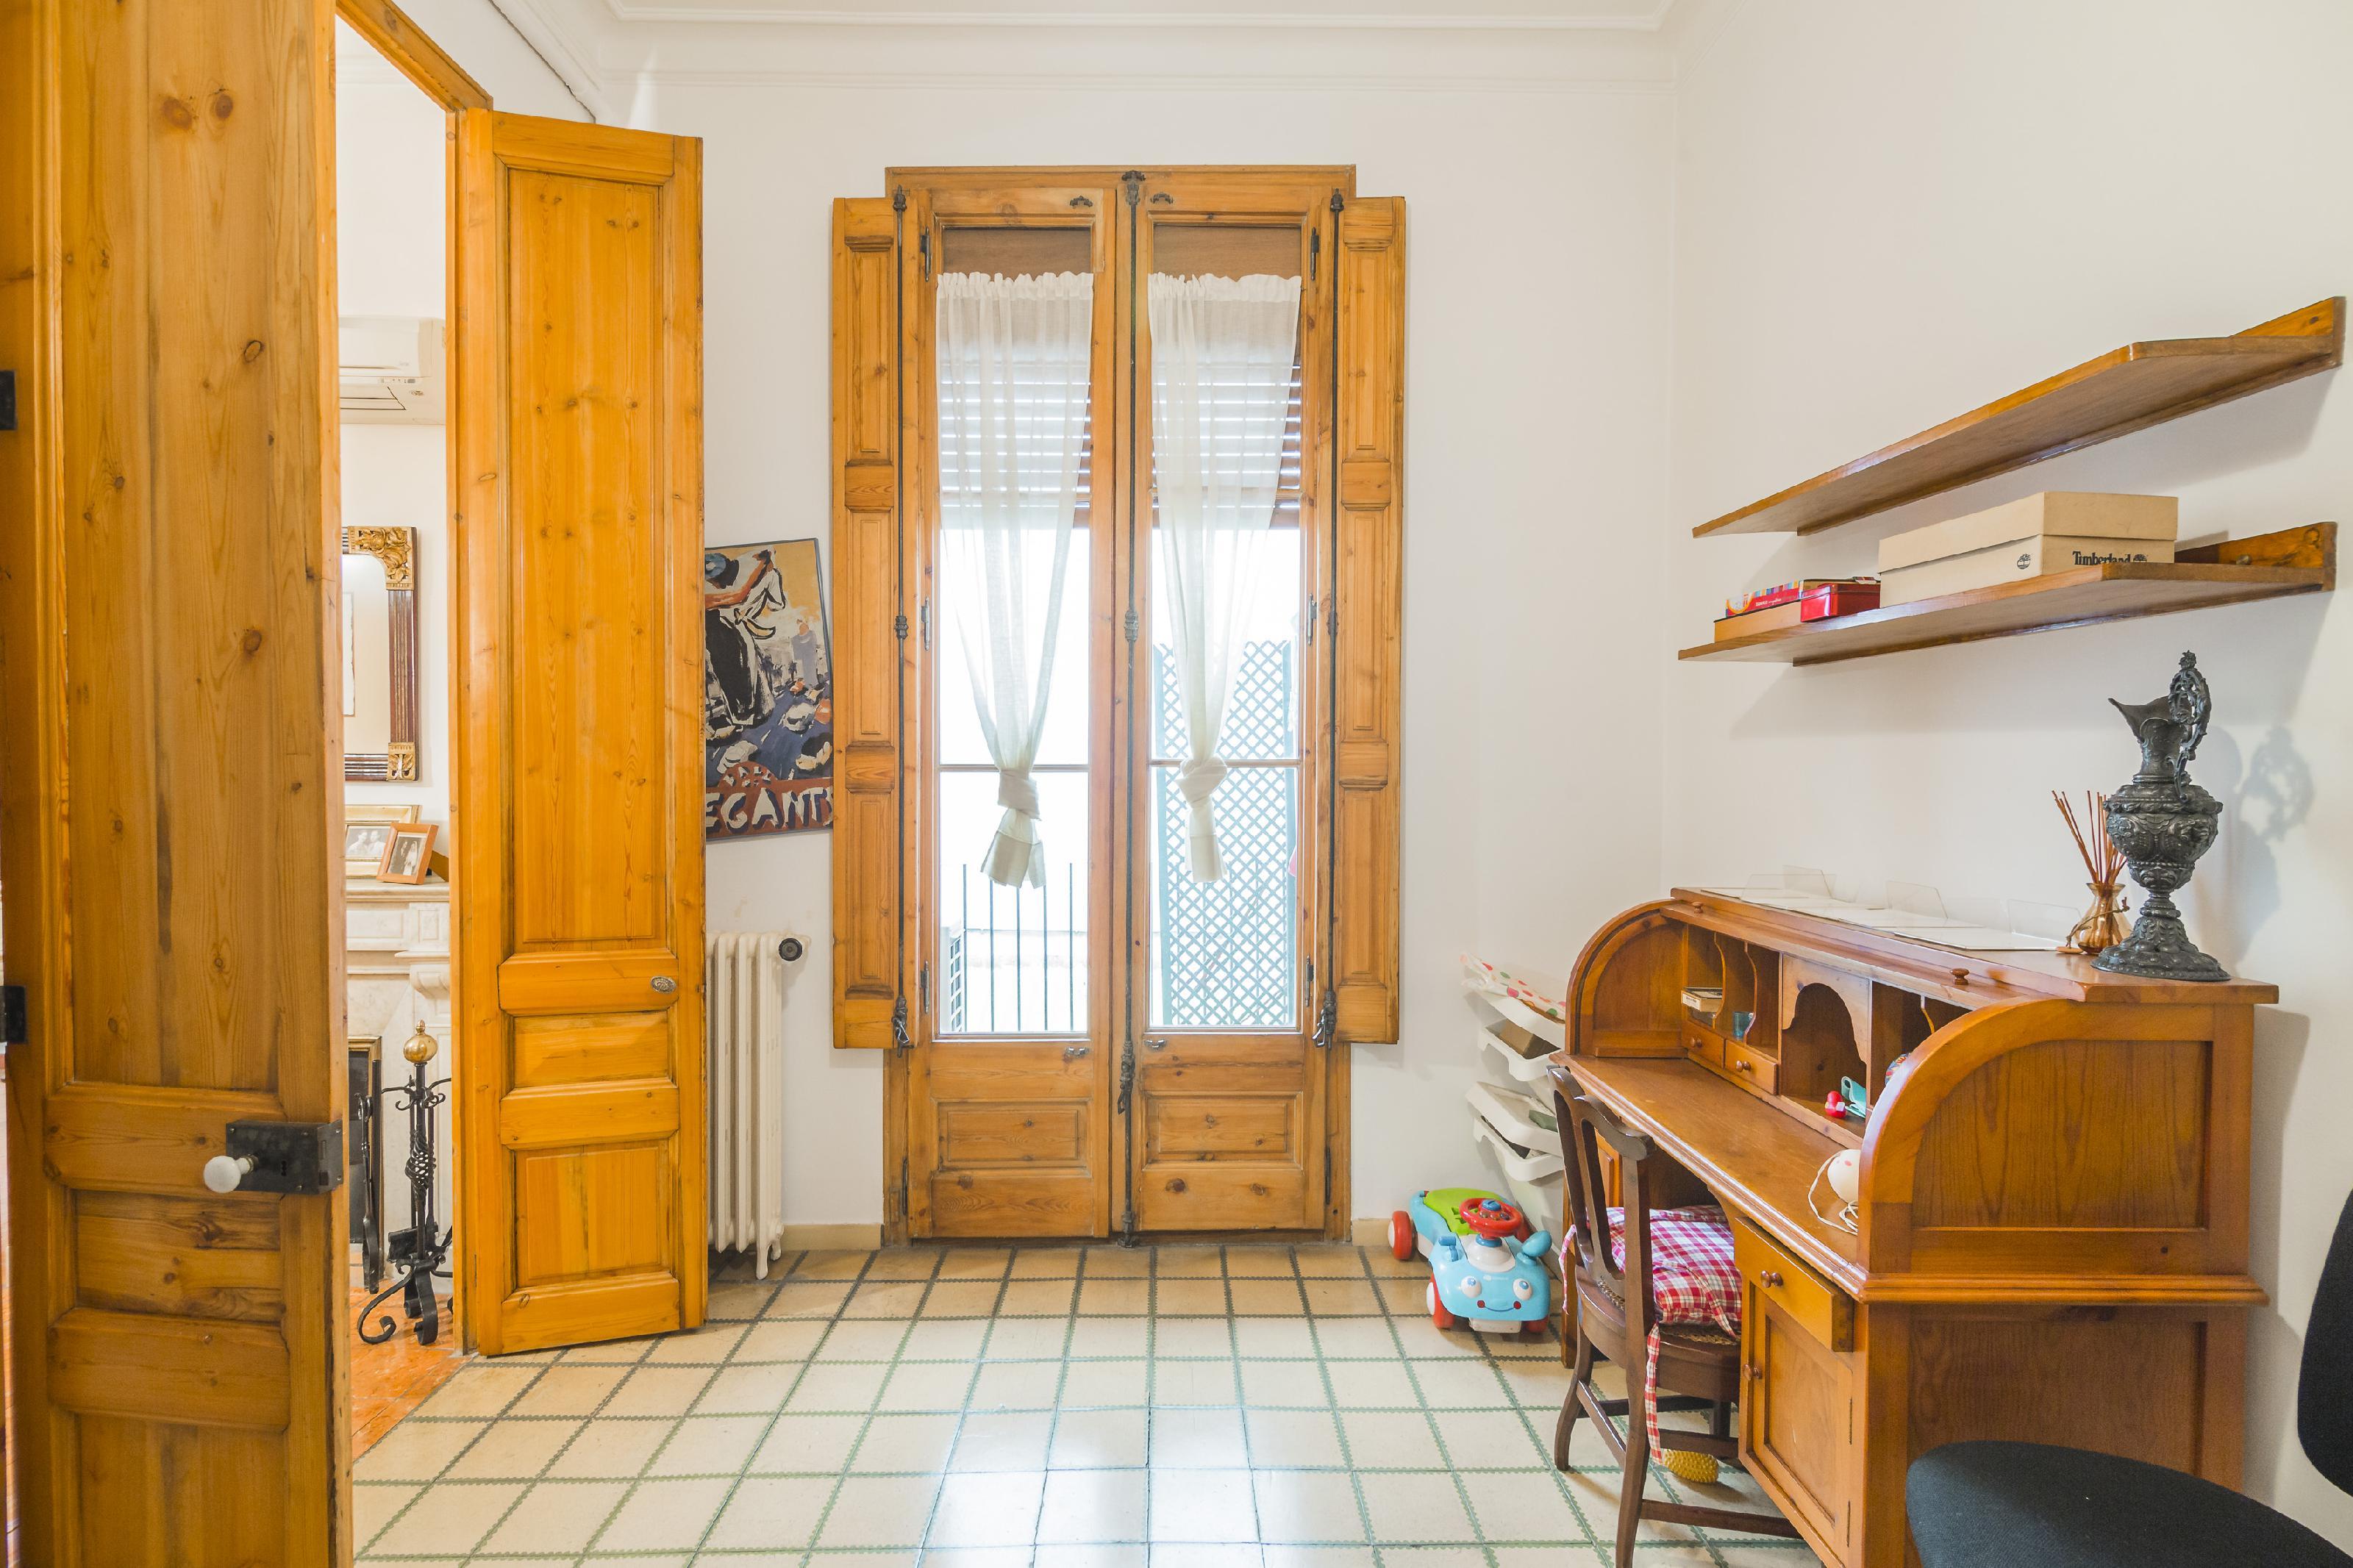 250020 Piso en venda en Gràcia, Vila de Gràcia 35